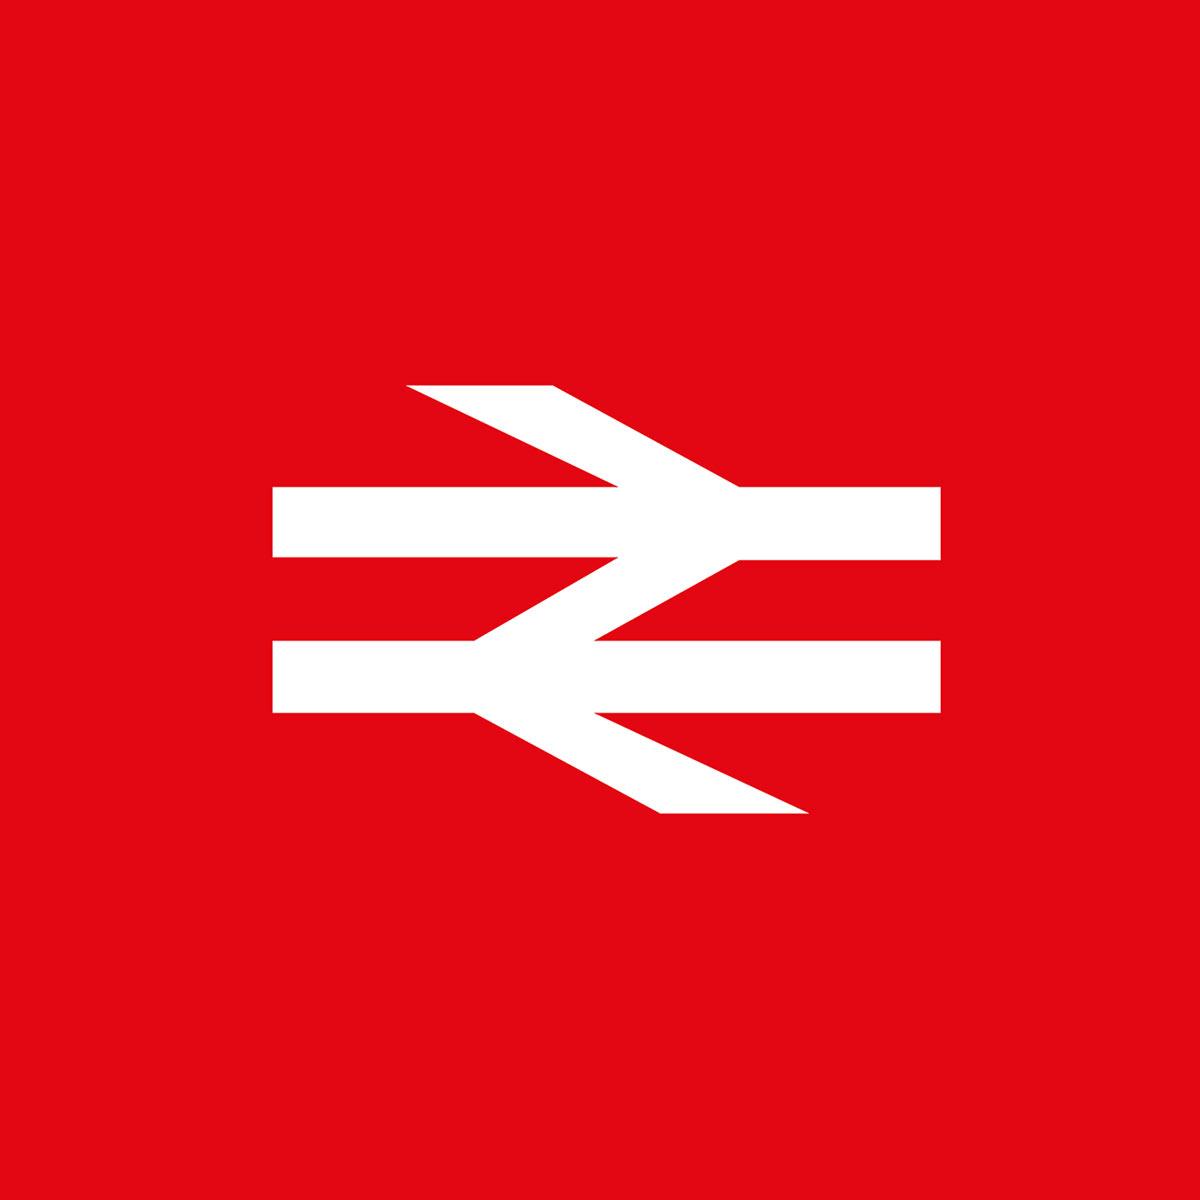 British Rail logo, Design Research Unit